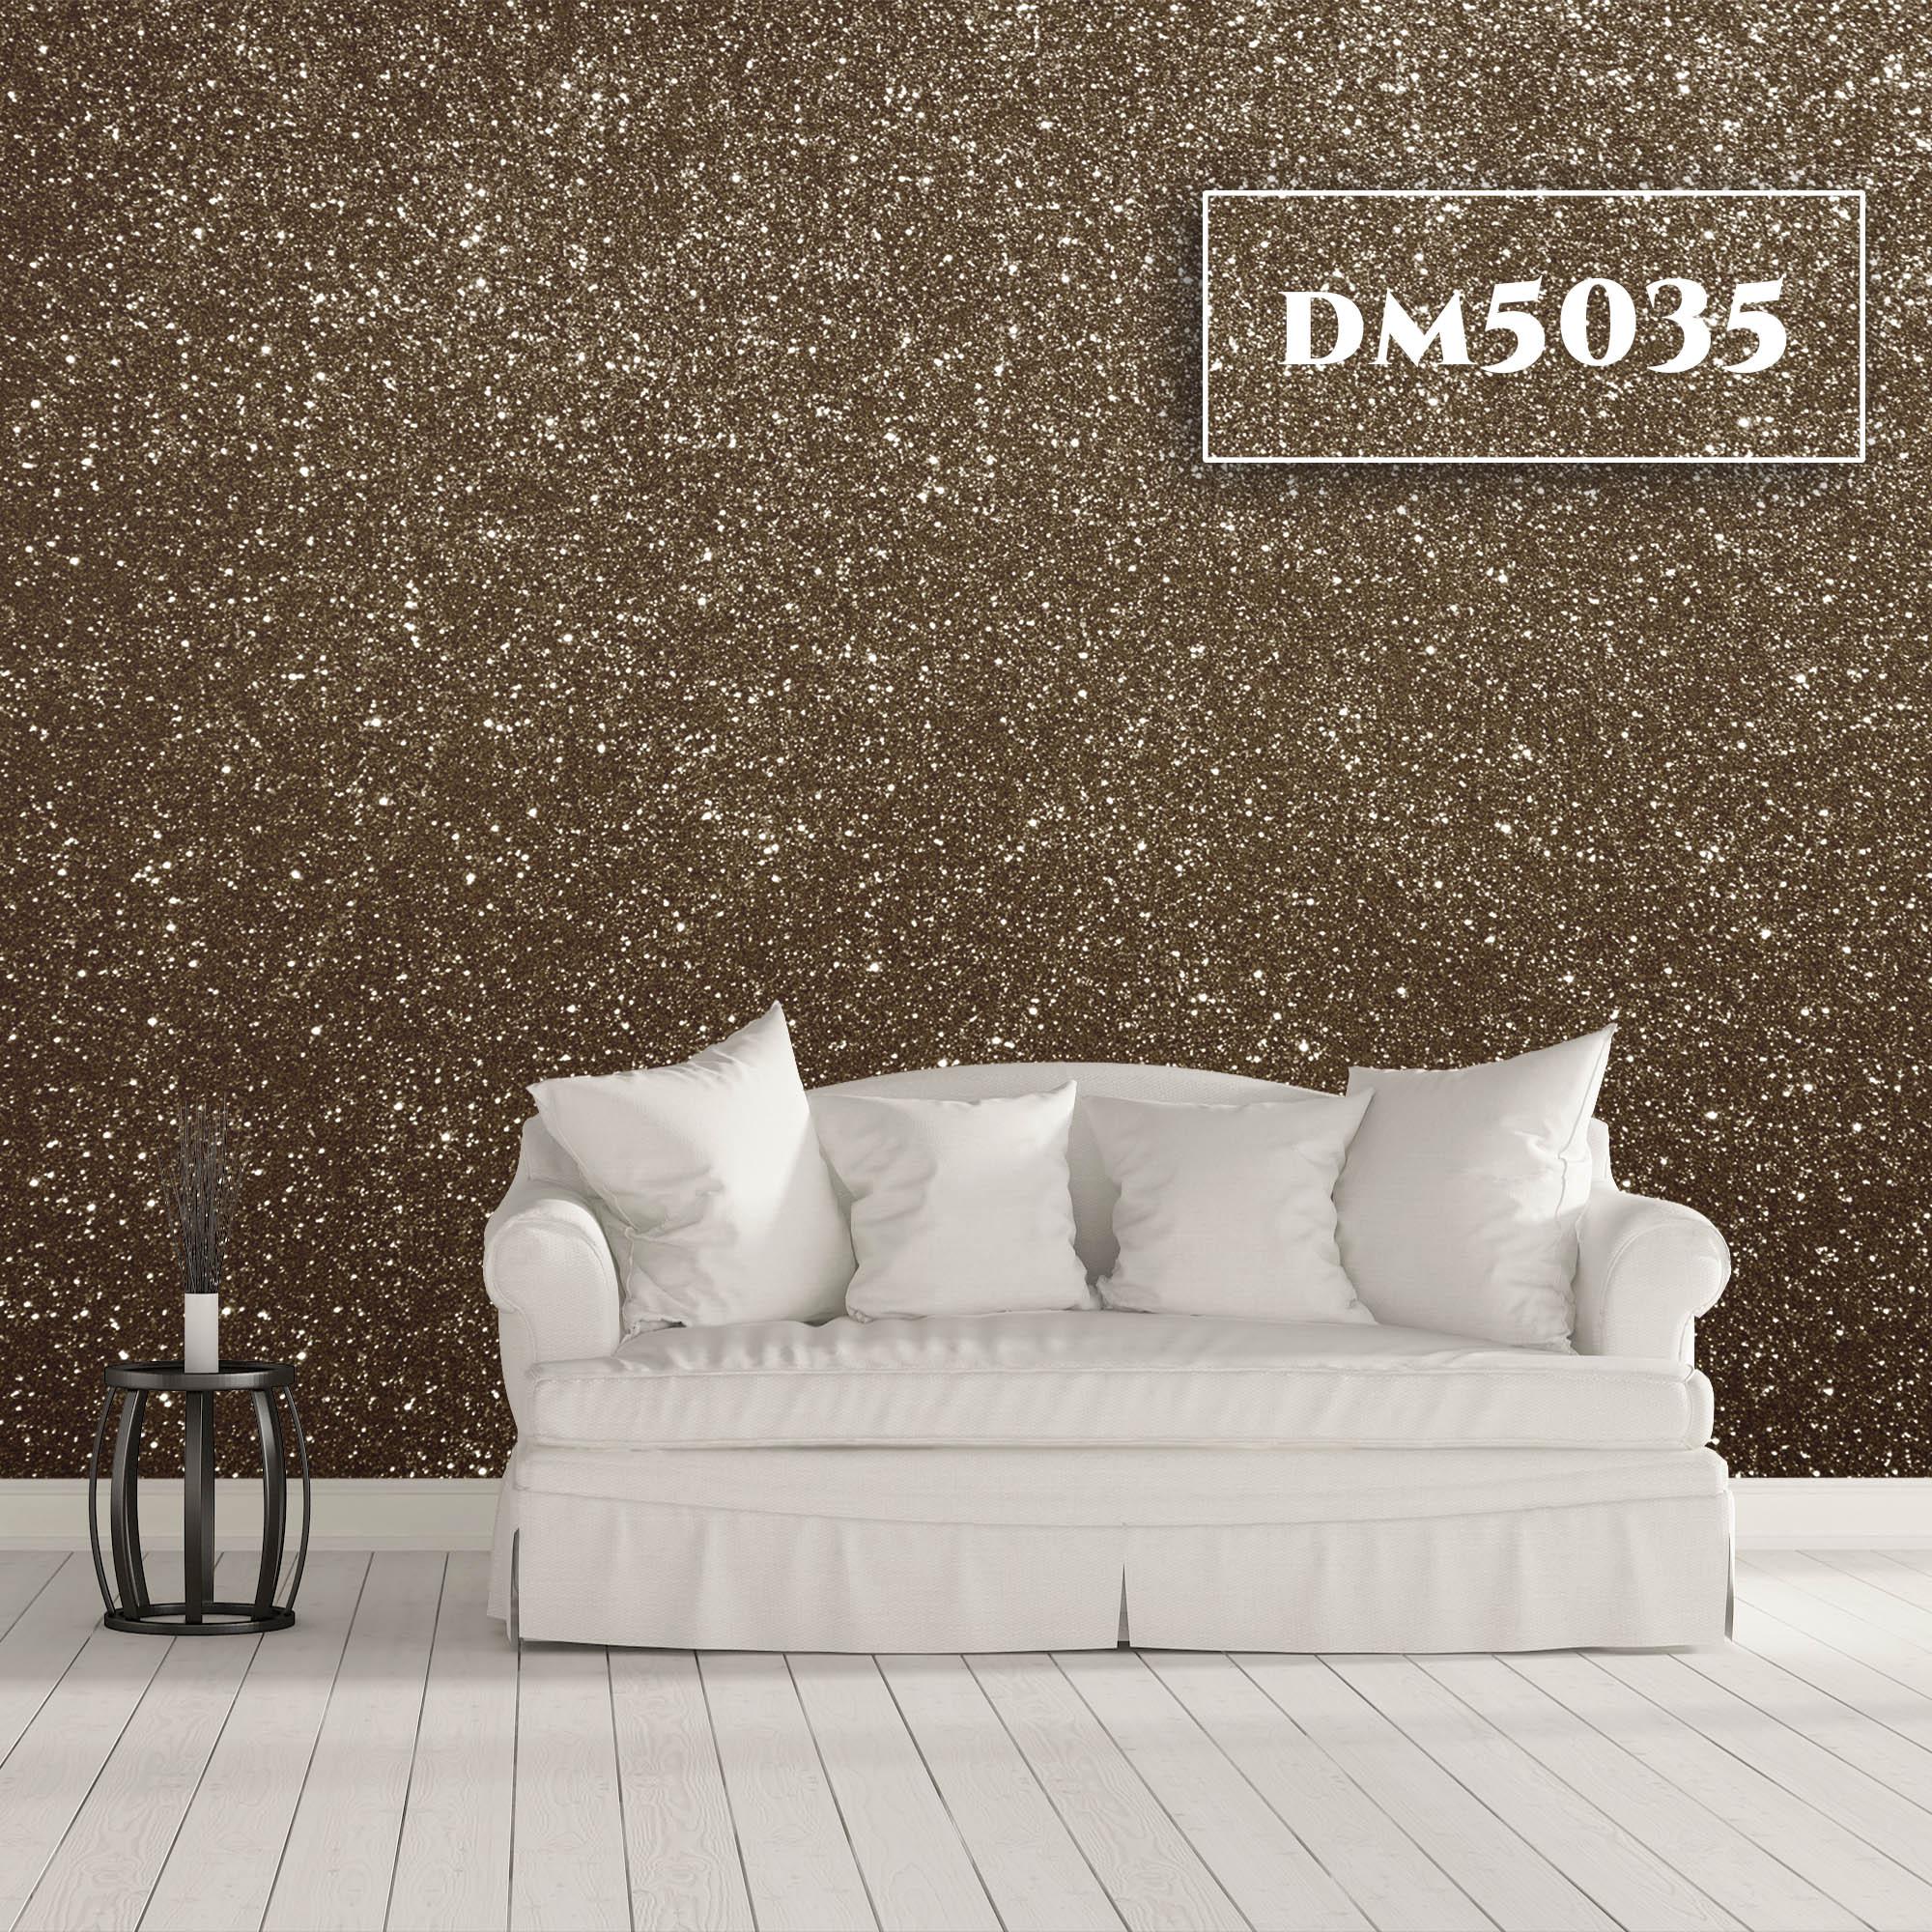 DM5035